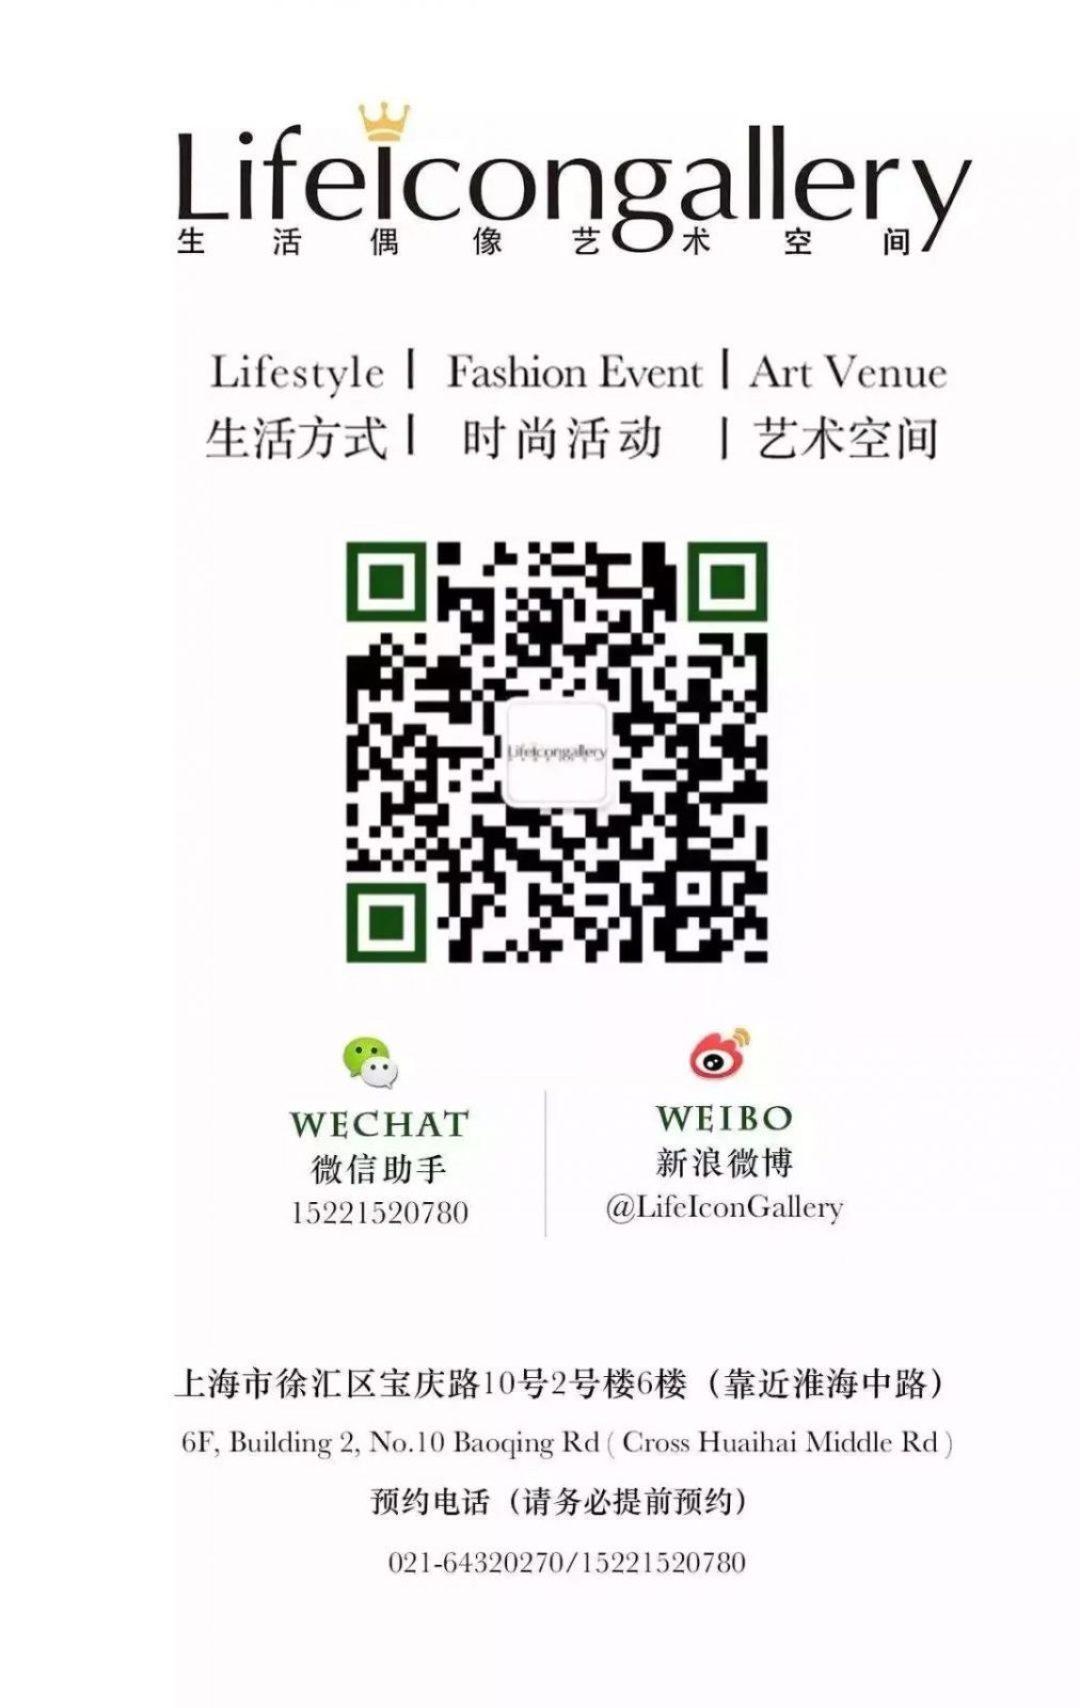 上海时装周-春夏2019。图片由LifeIcon Gallery提供